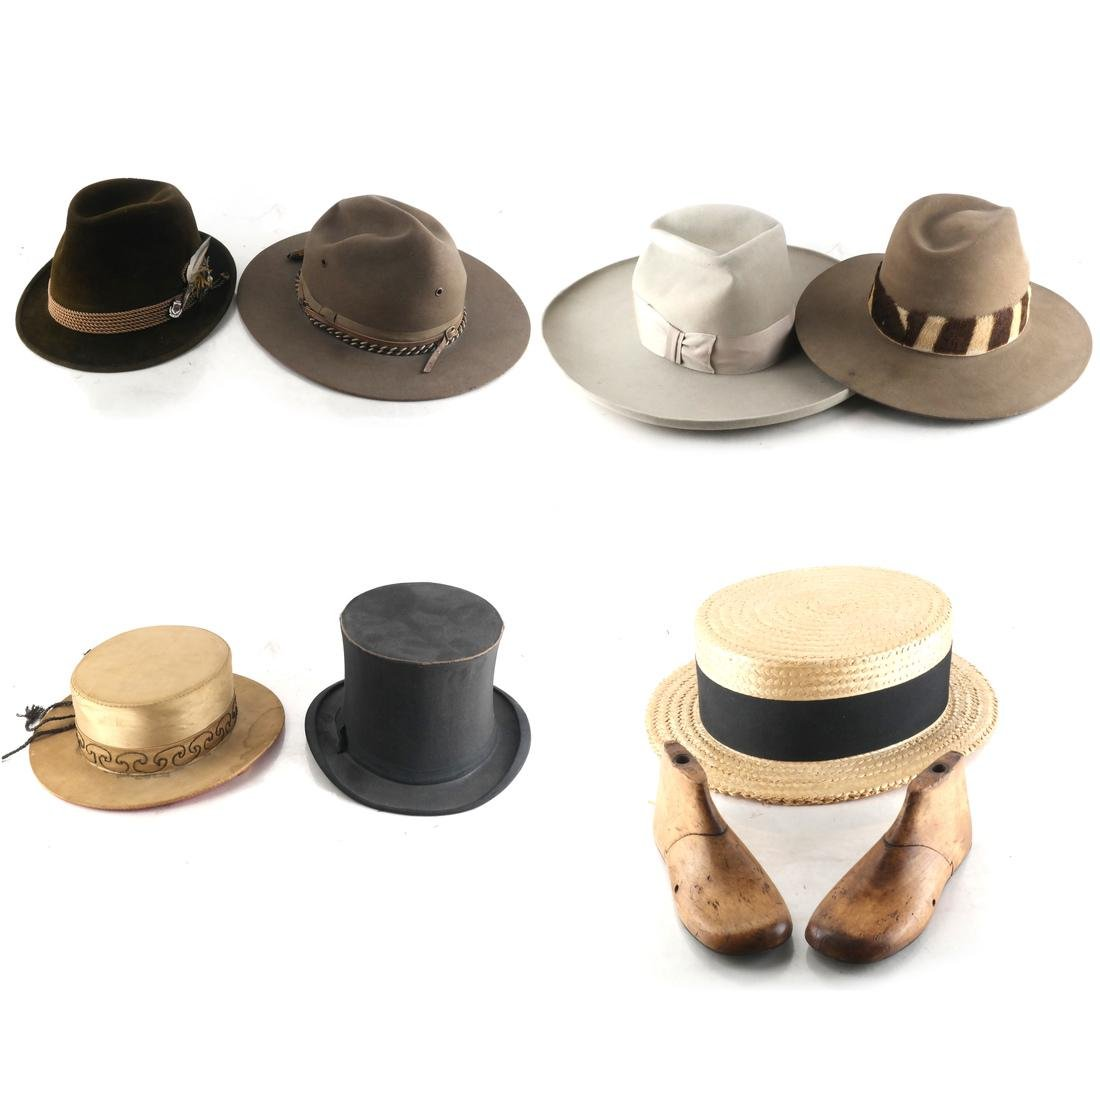 8 Historic Costume Articles